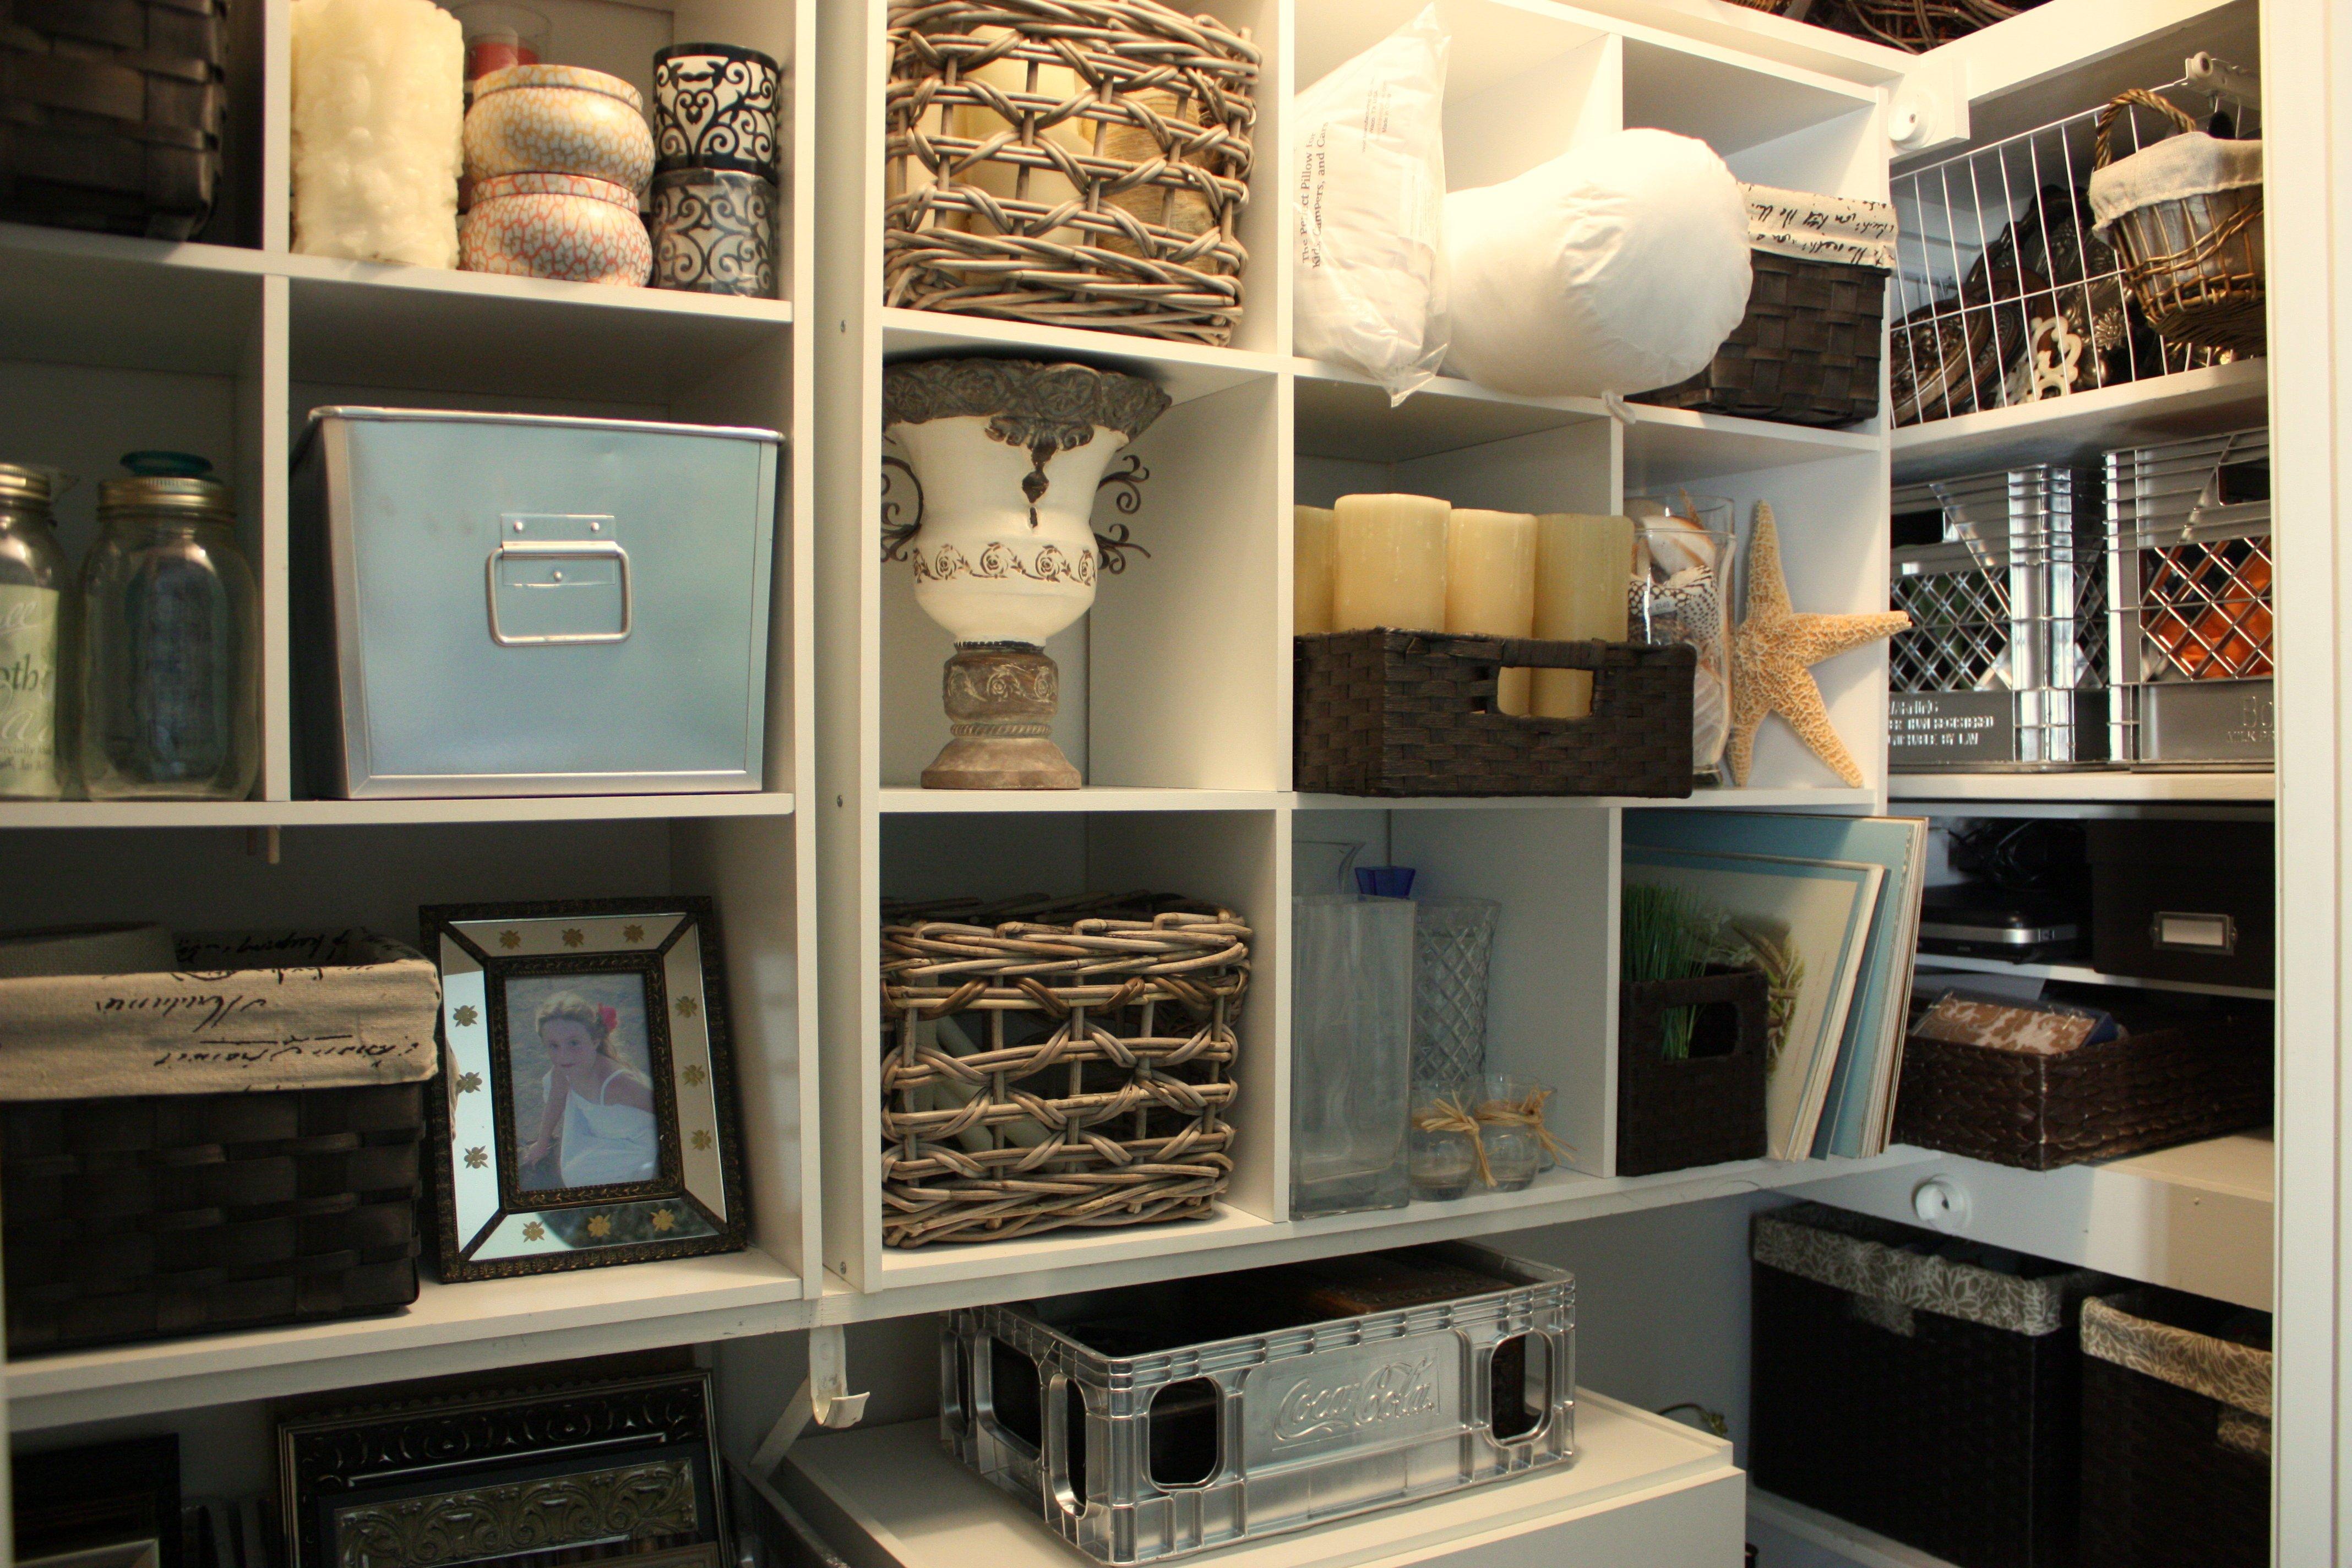 office closet organization ideas. junk closet organized office organization ideas